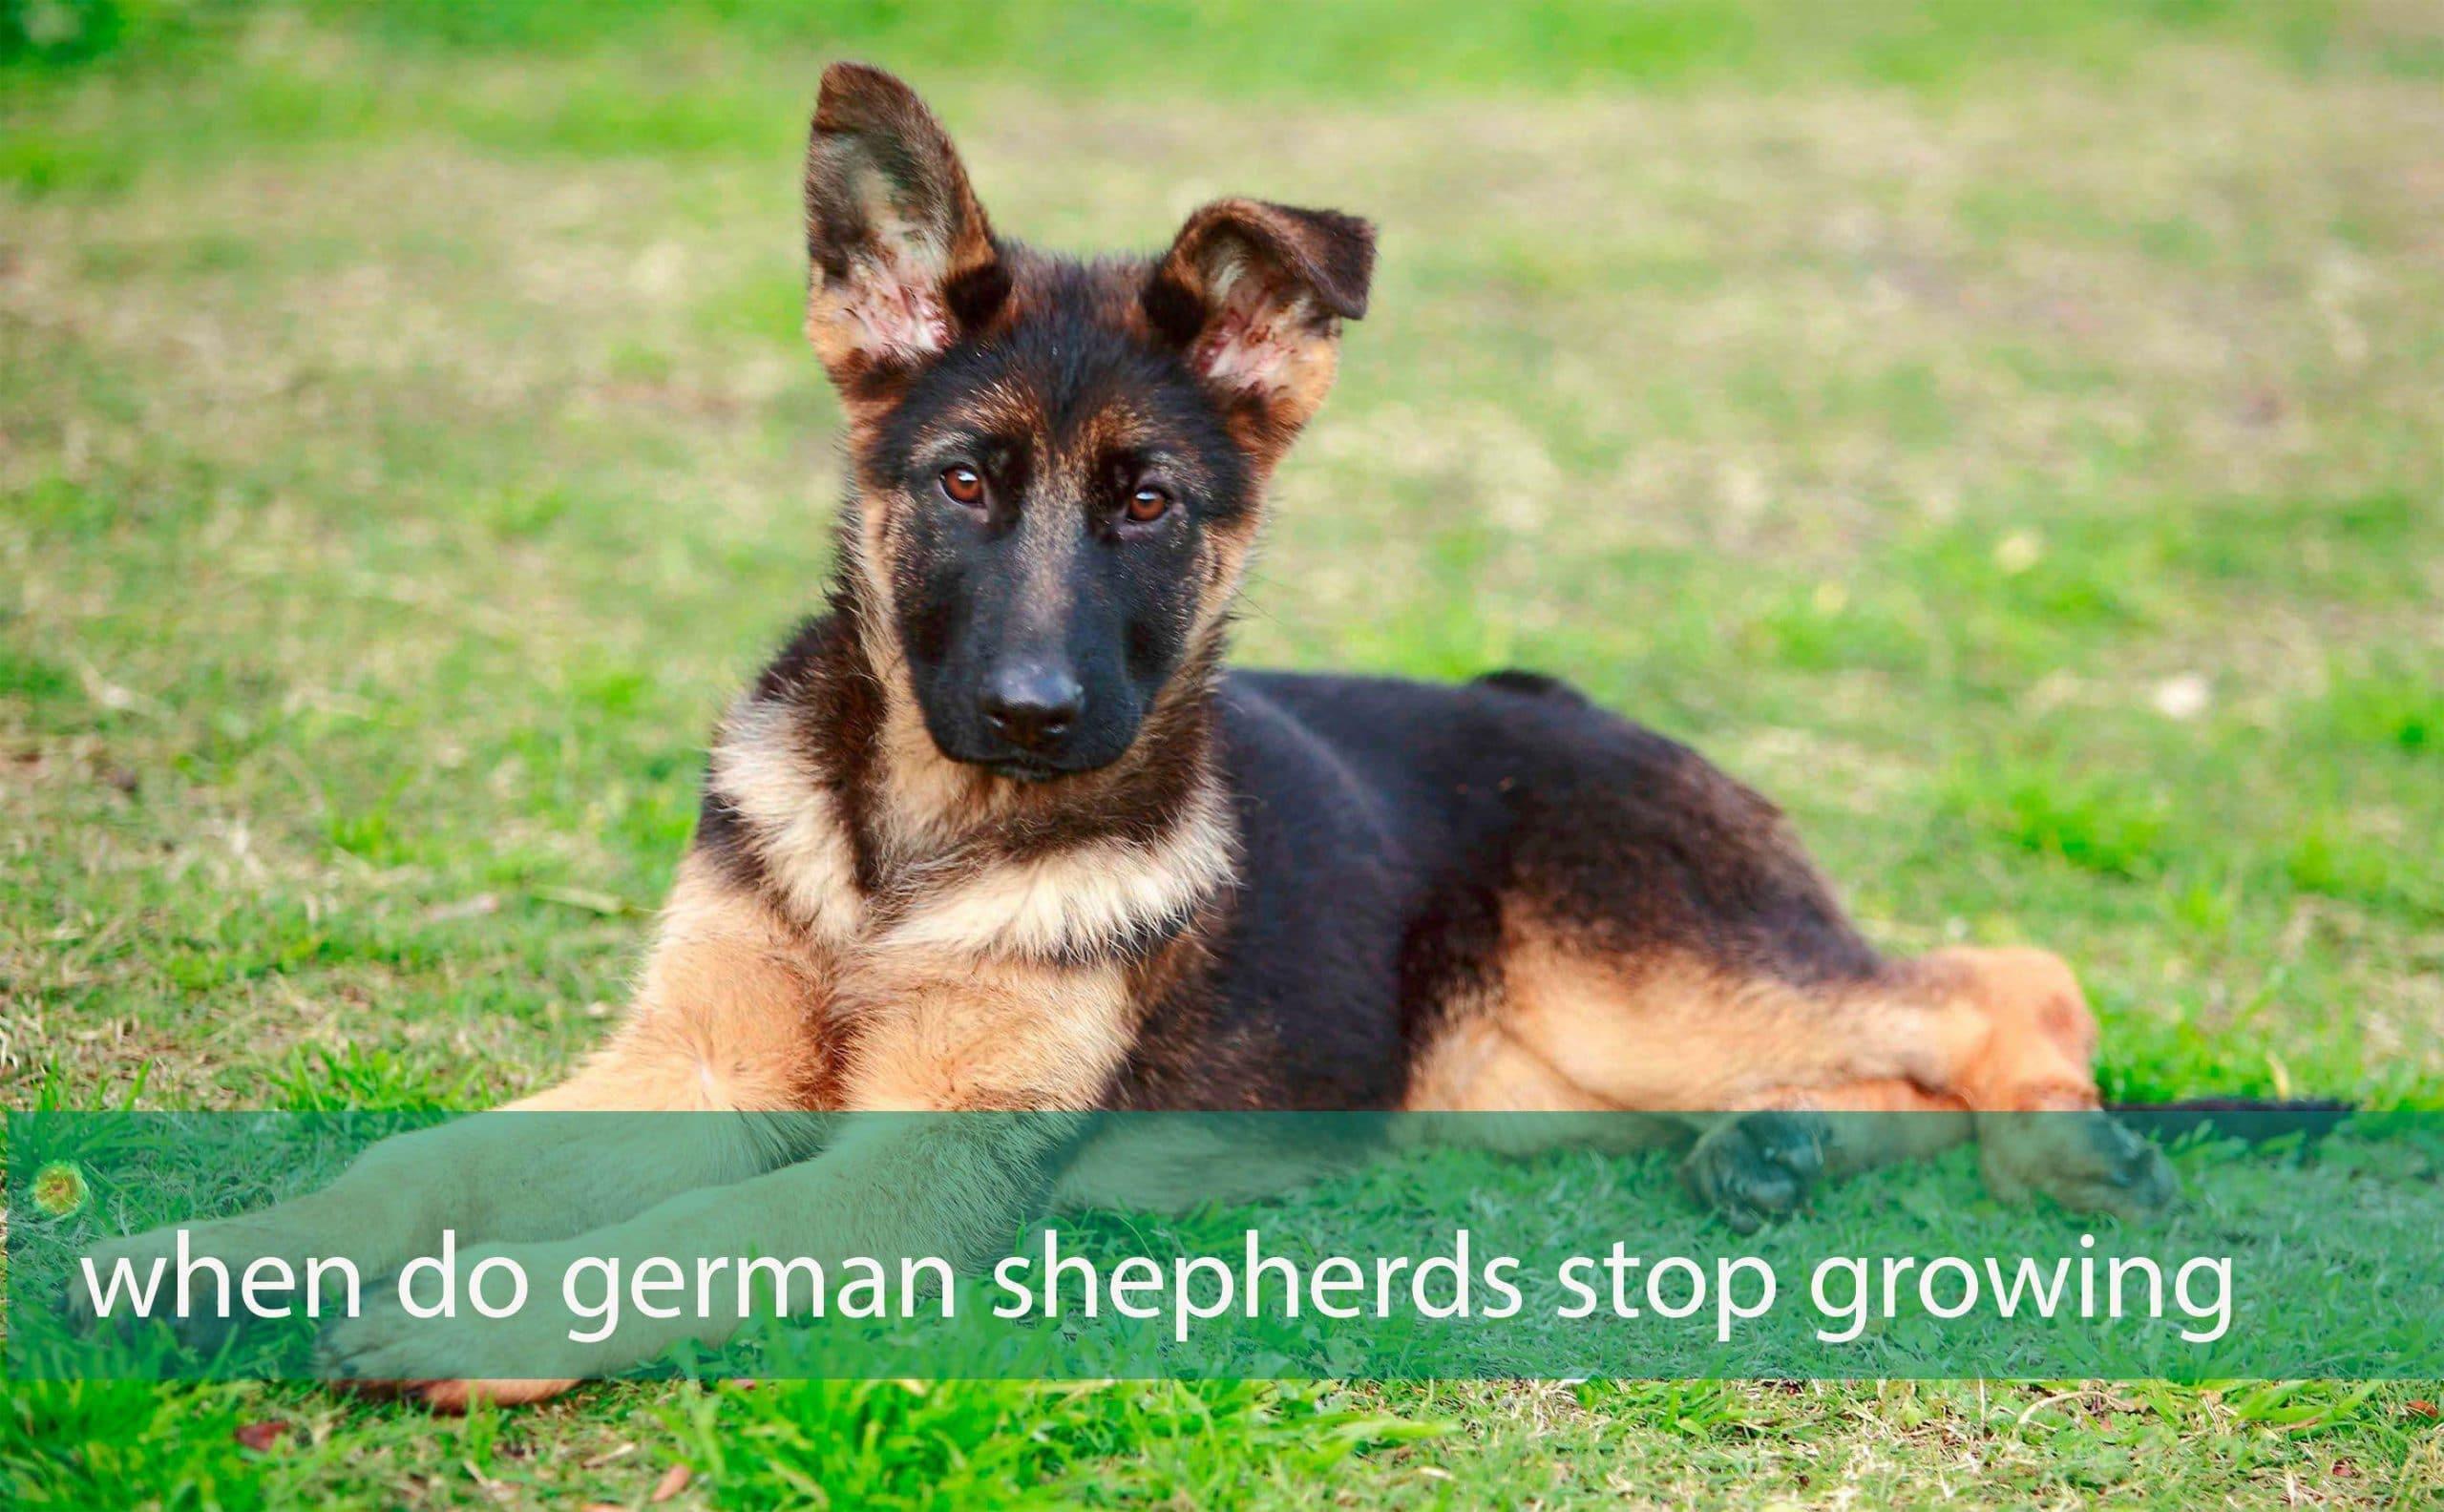 When do german shepherds stop growing?